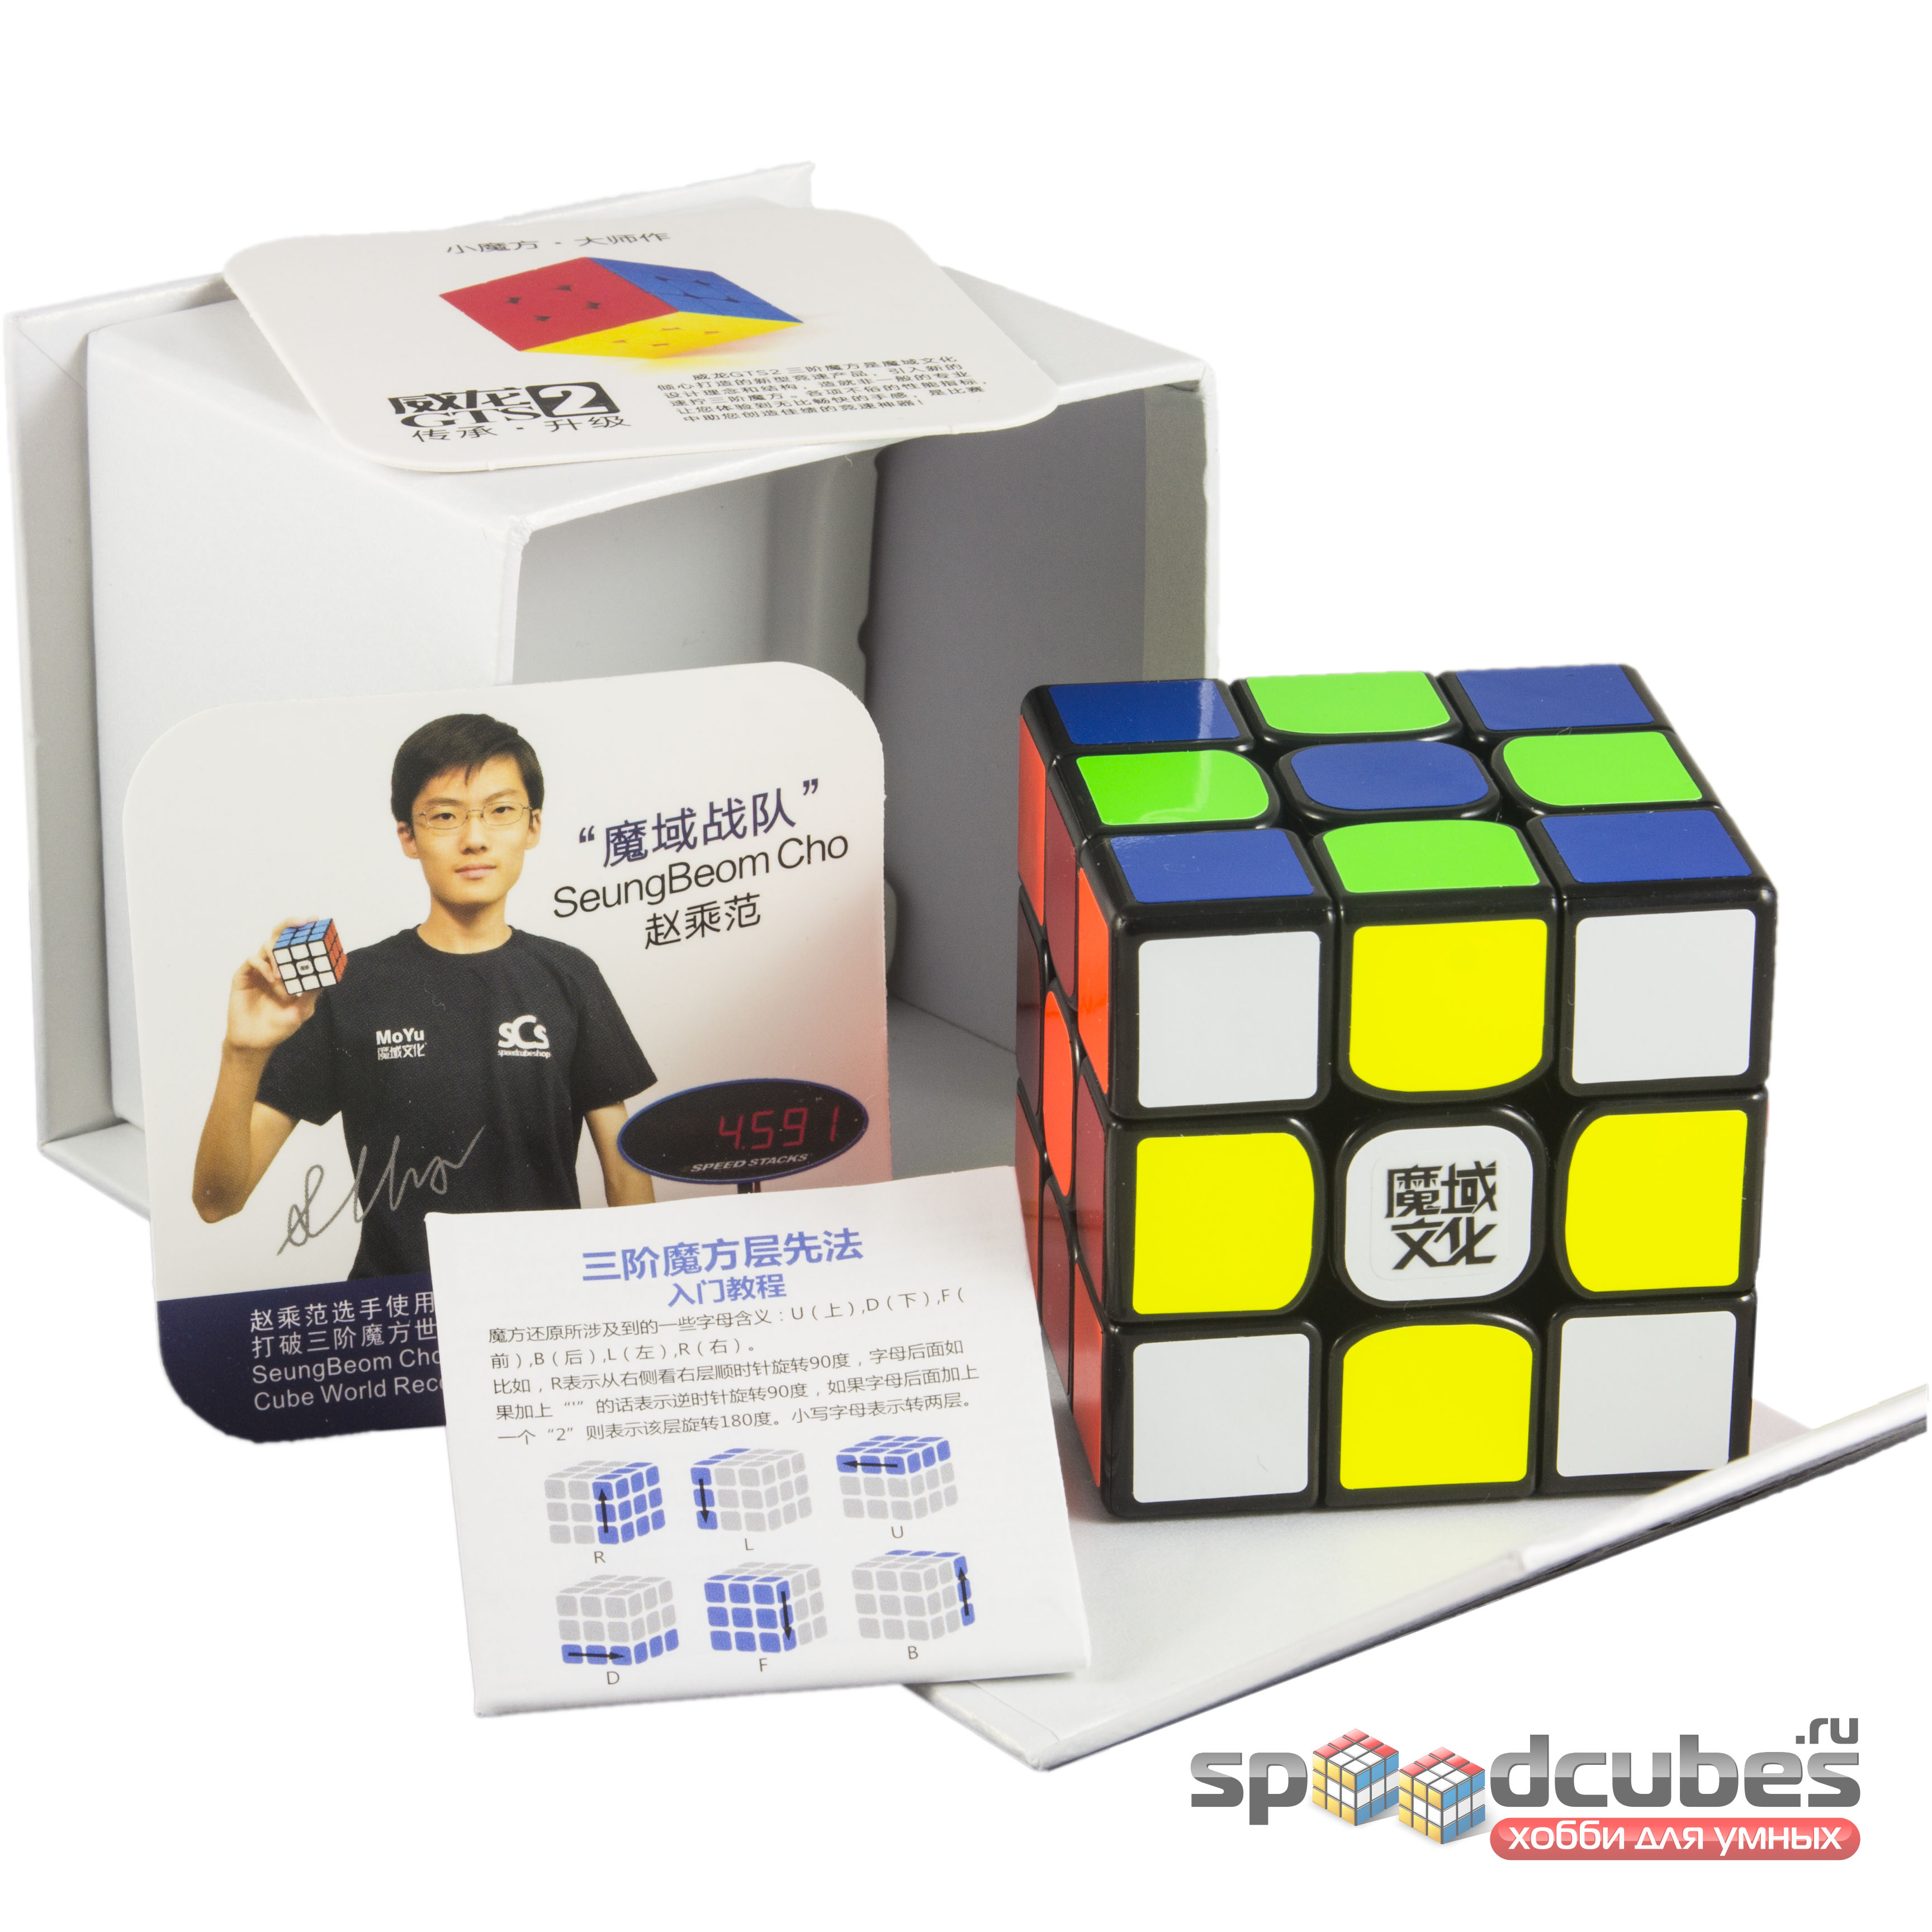 Moyu 3x3x3 Weilong Gts V2 Black 2